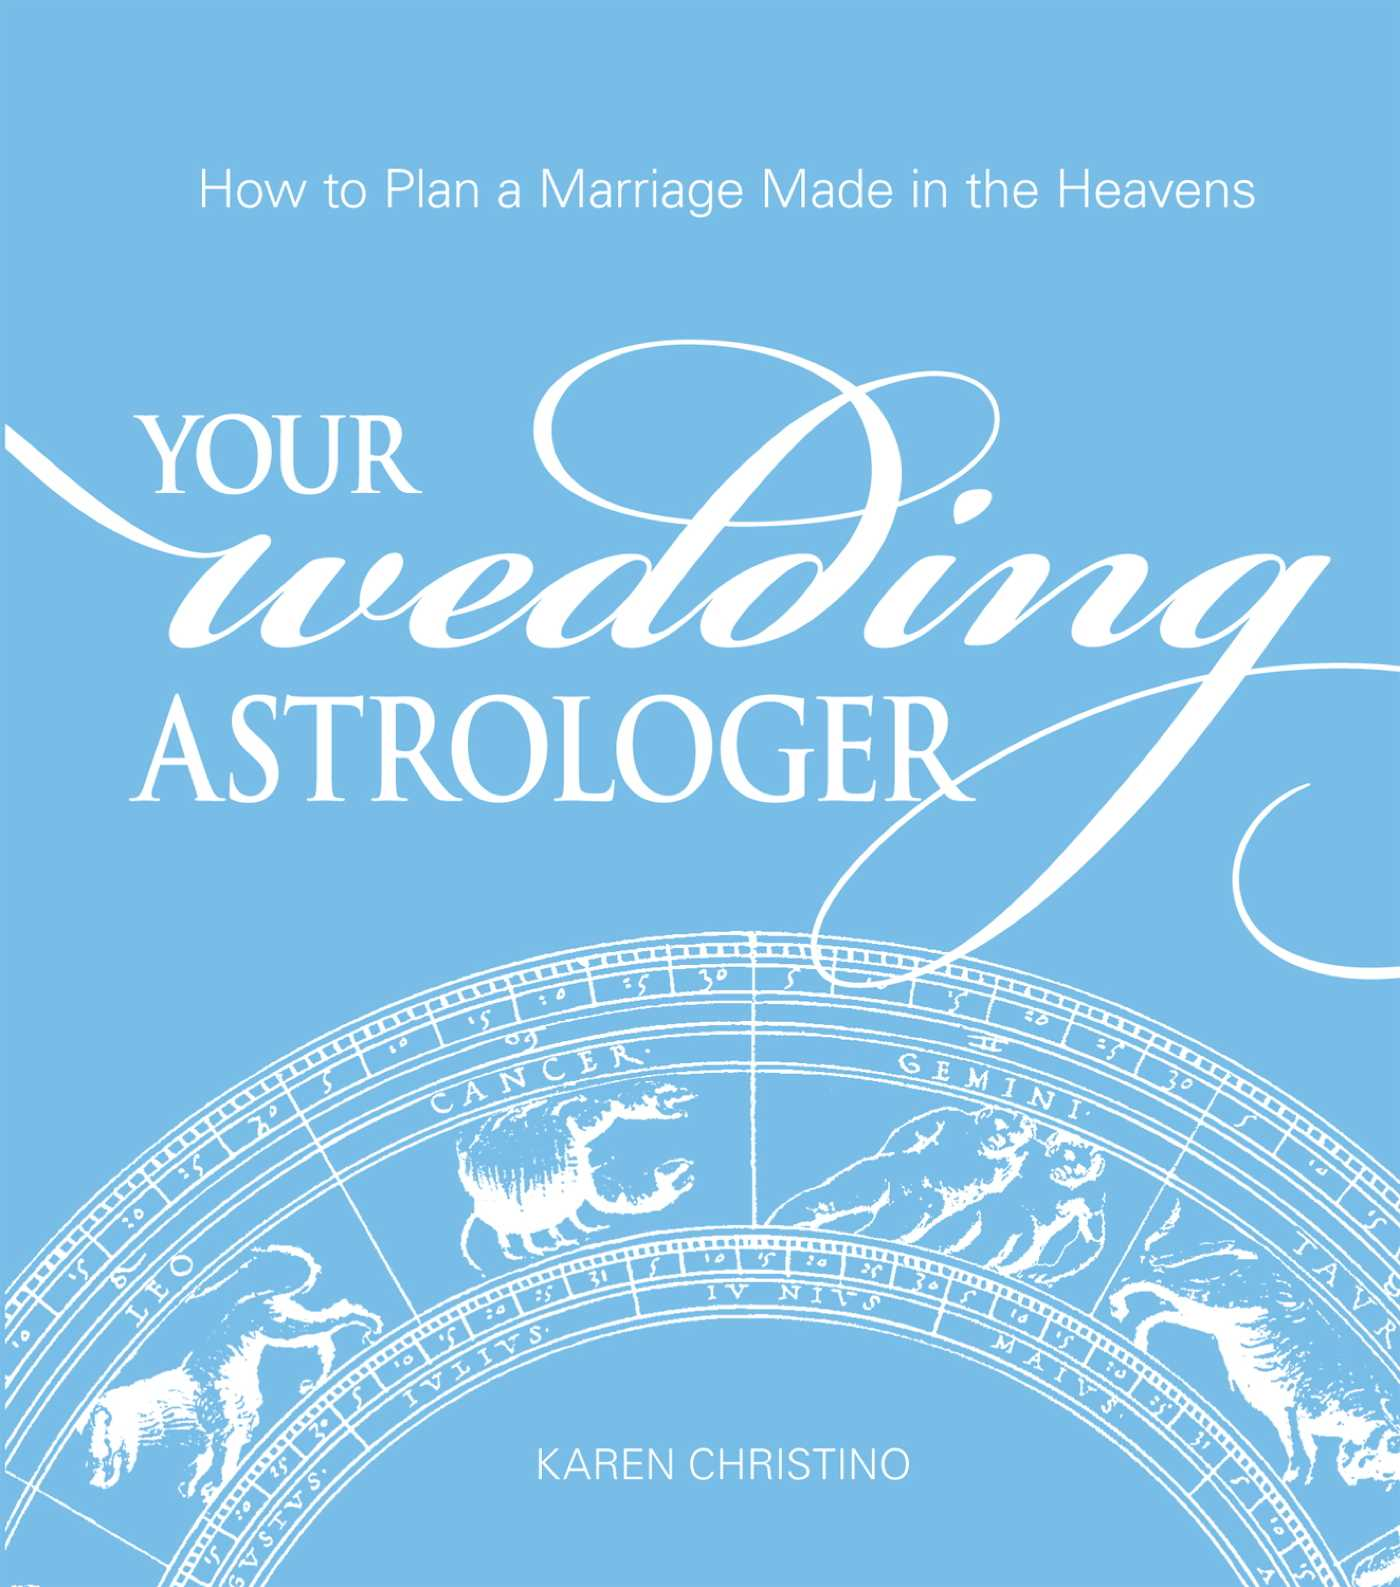 Your wedding astrologer 9781440515347 hr